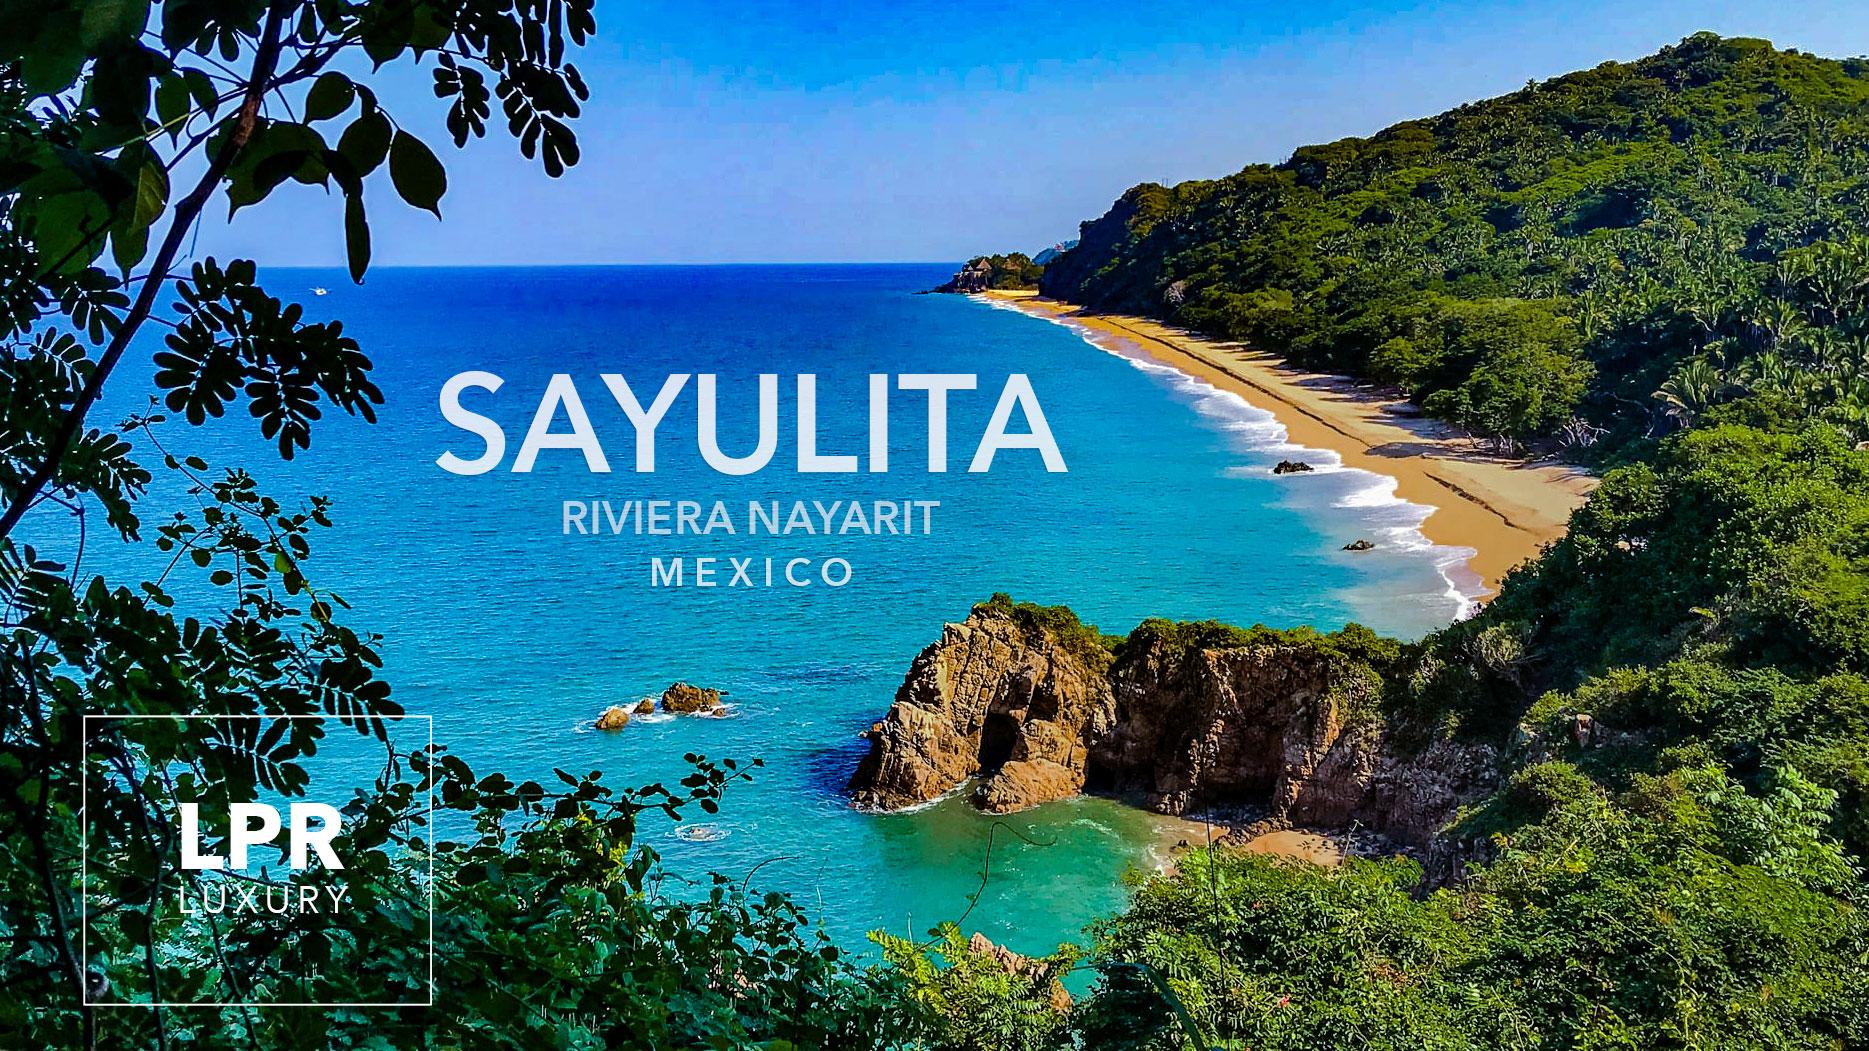 Las Brisas Sayulita - Development land - Riviera Nayarit, Mexico